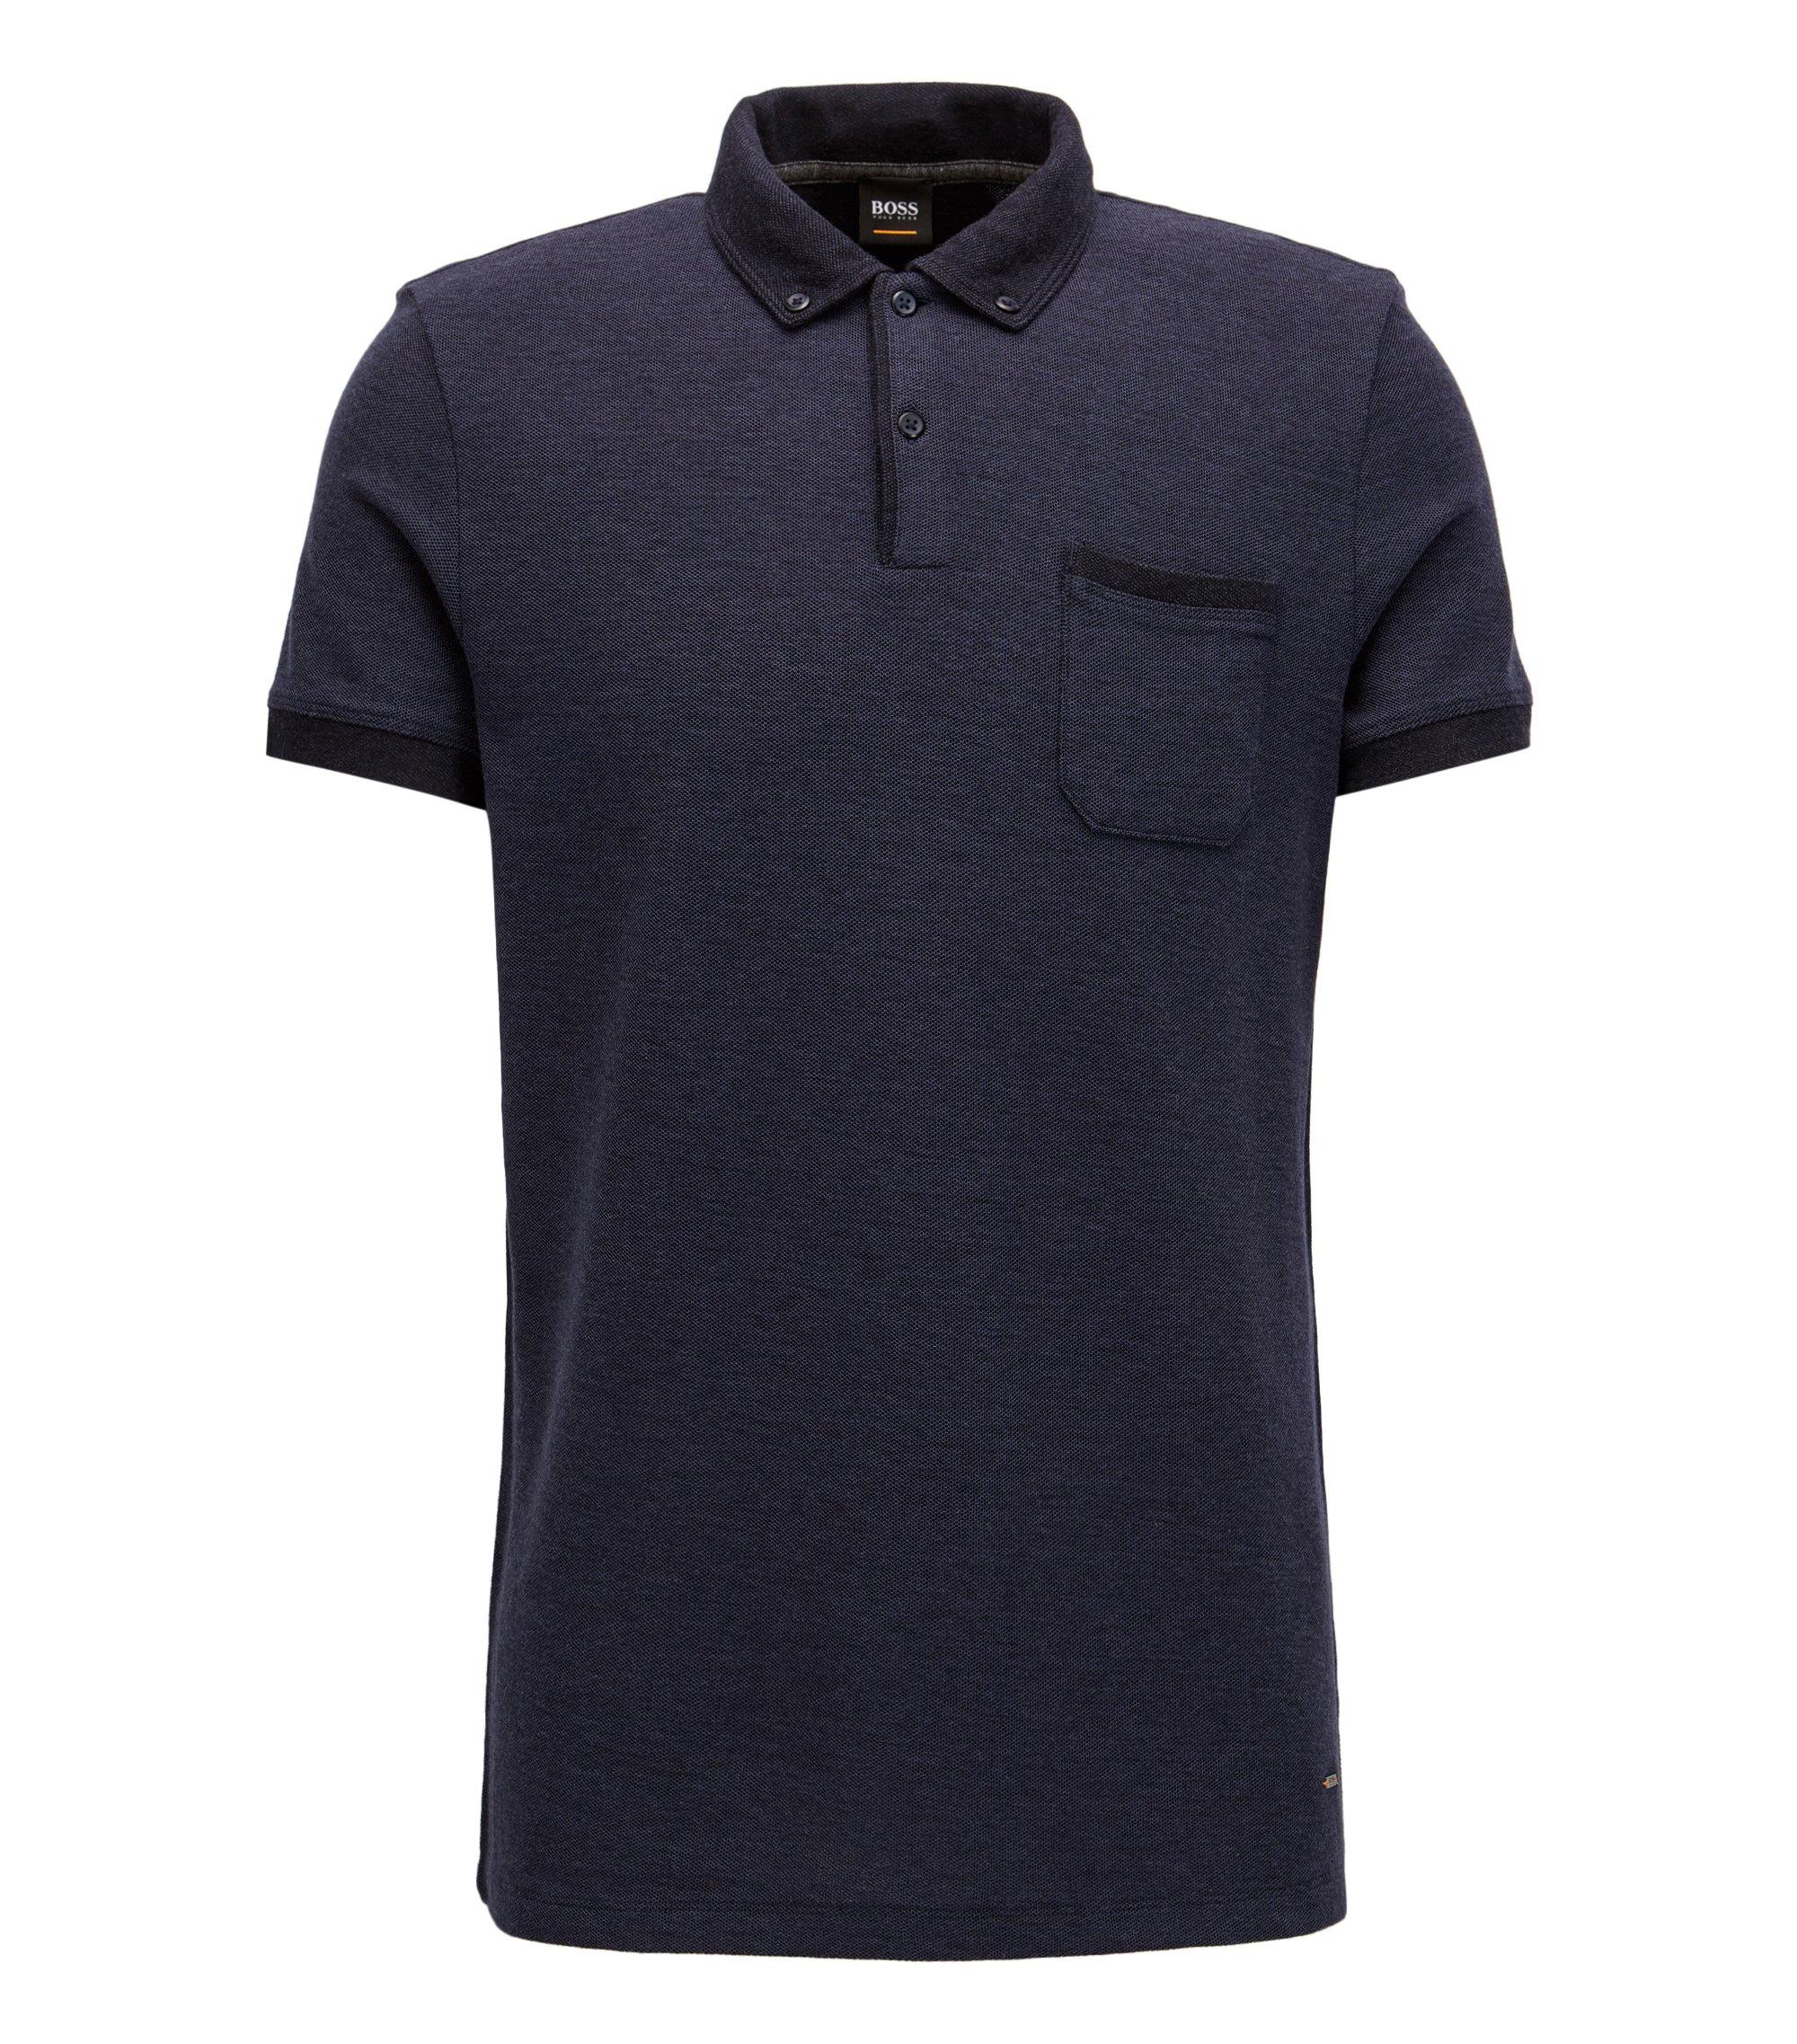 Polo regular fit jaspeado en tejido de piqué de mezcla de algodón con detalles en contraste, Azul oscuro